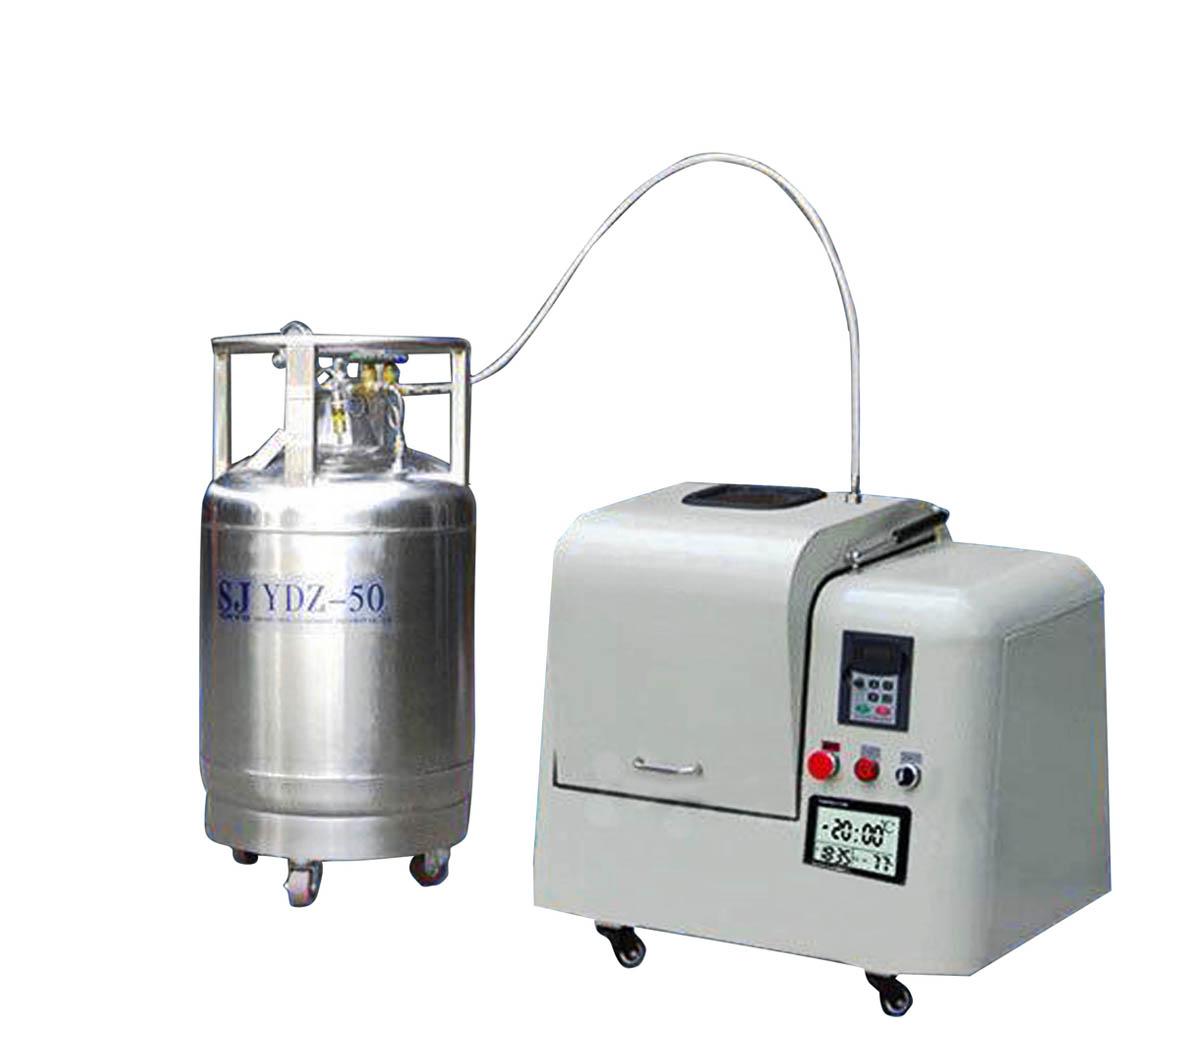 Low Temperature Liquid Nitrogen Cryogenic Mill CY-YDQM-2L